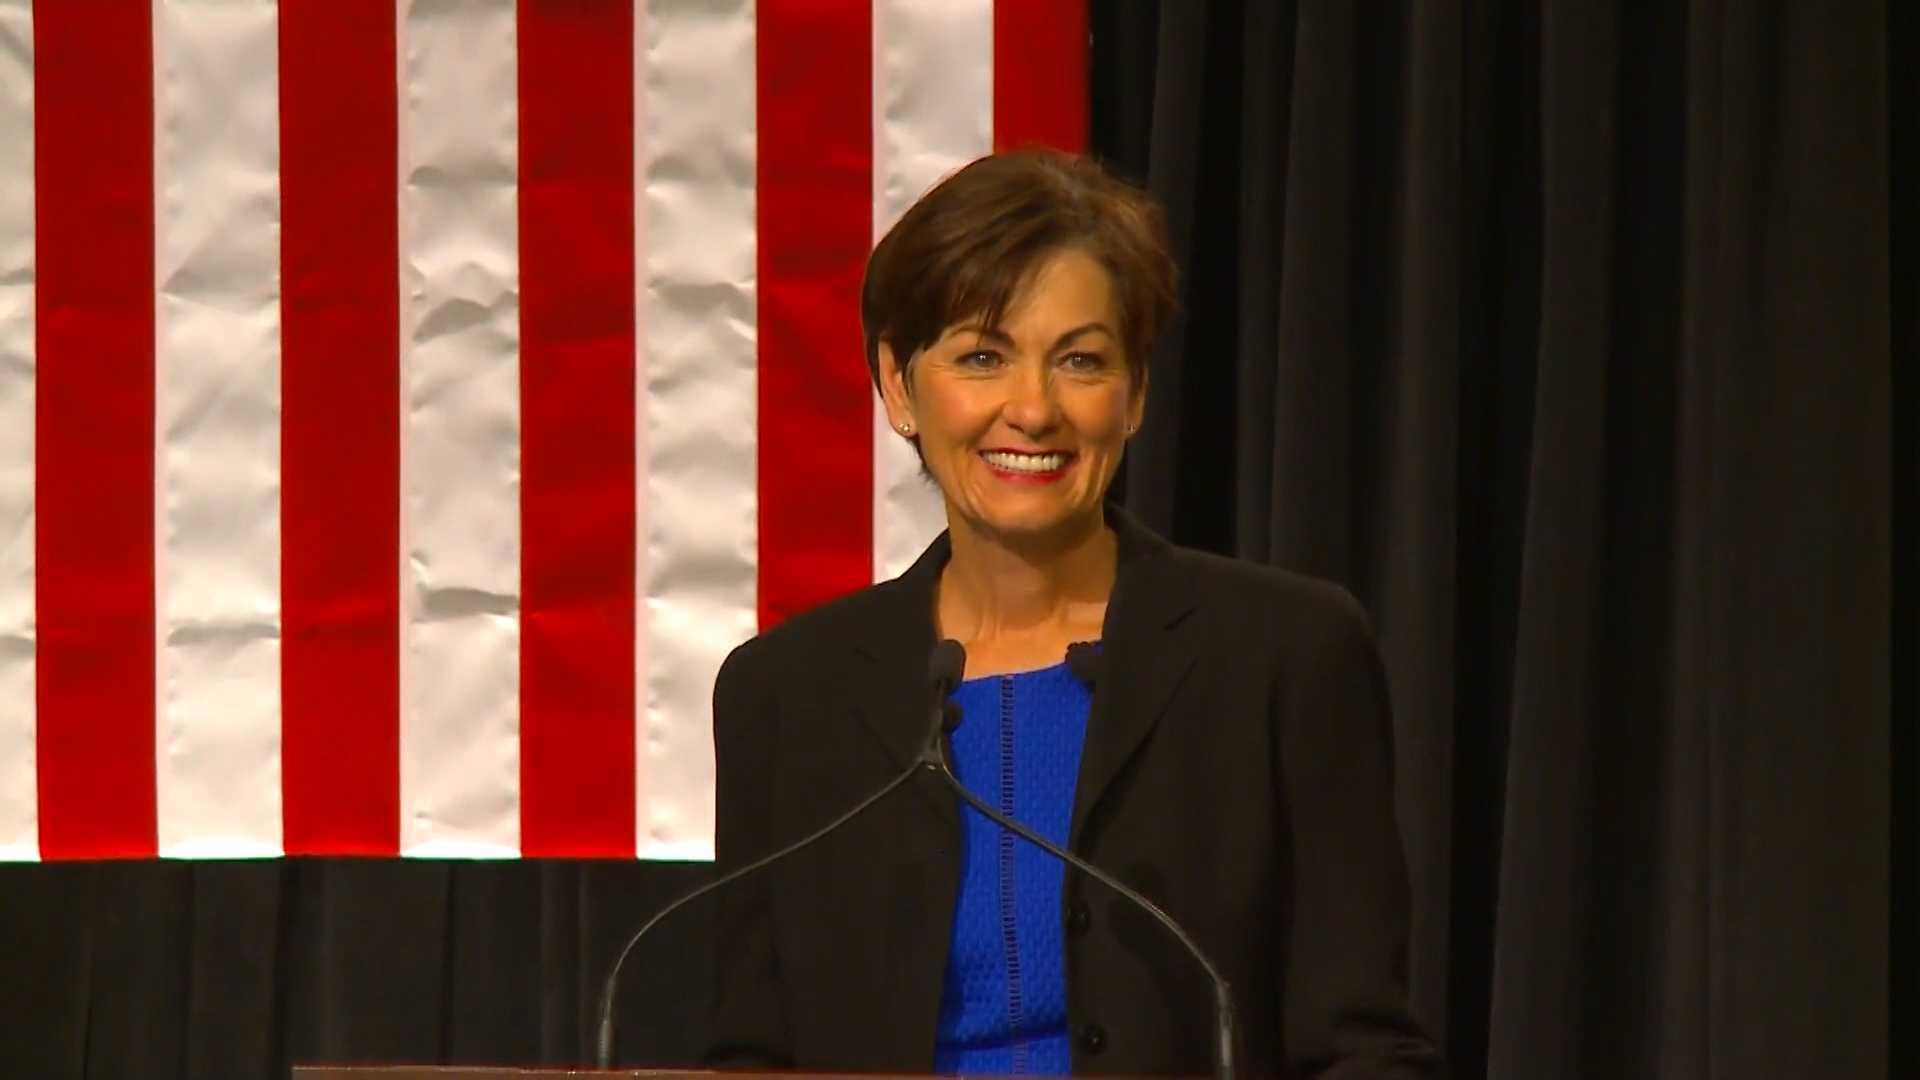 Reynolds sworn-in as Iowa Governor